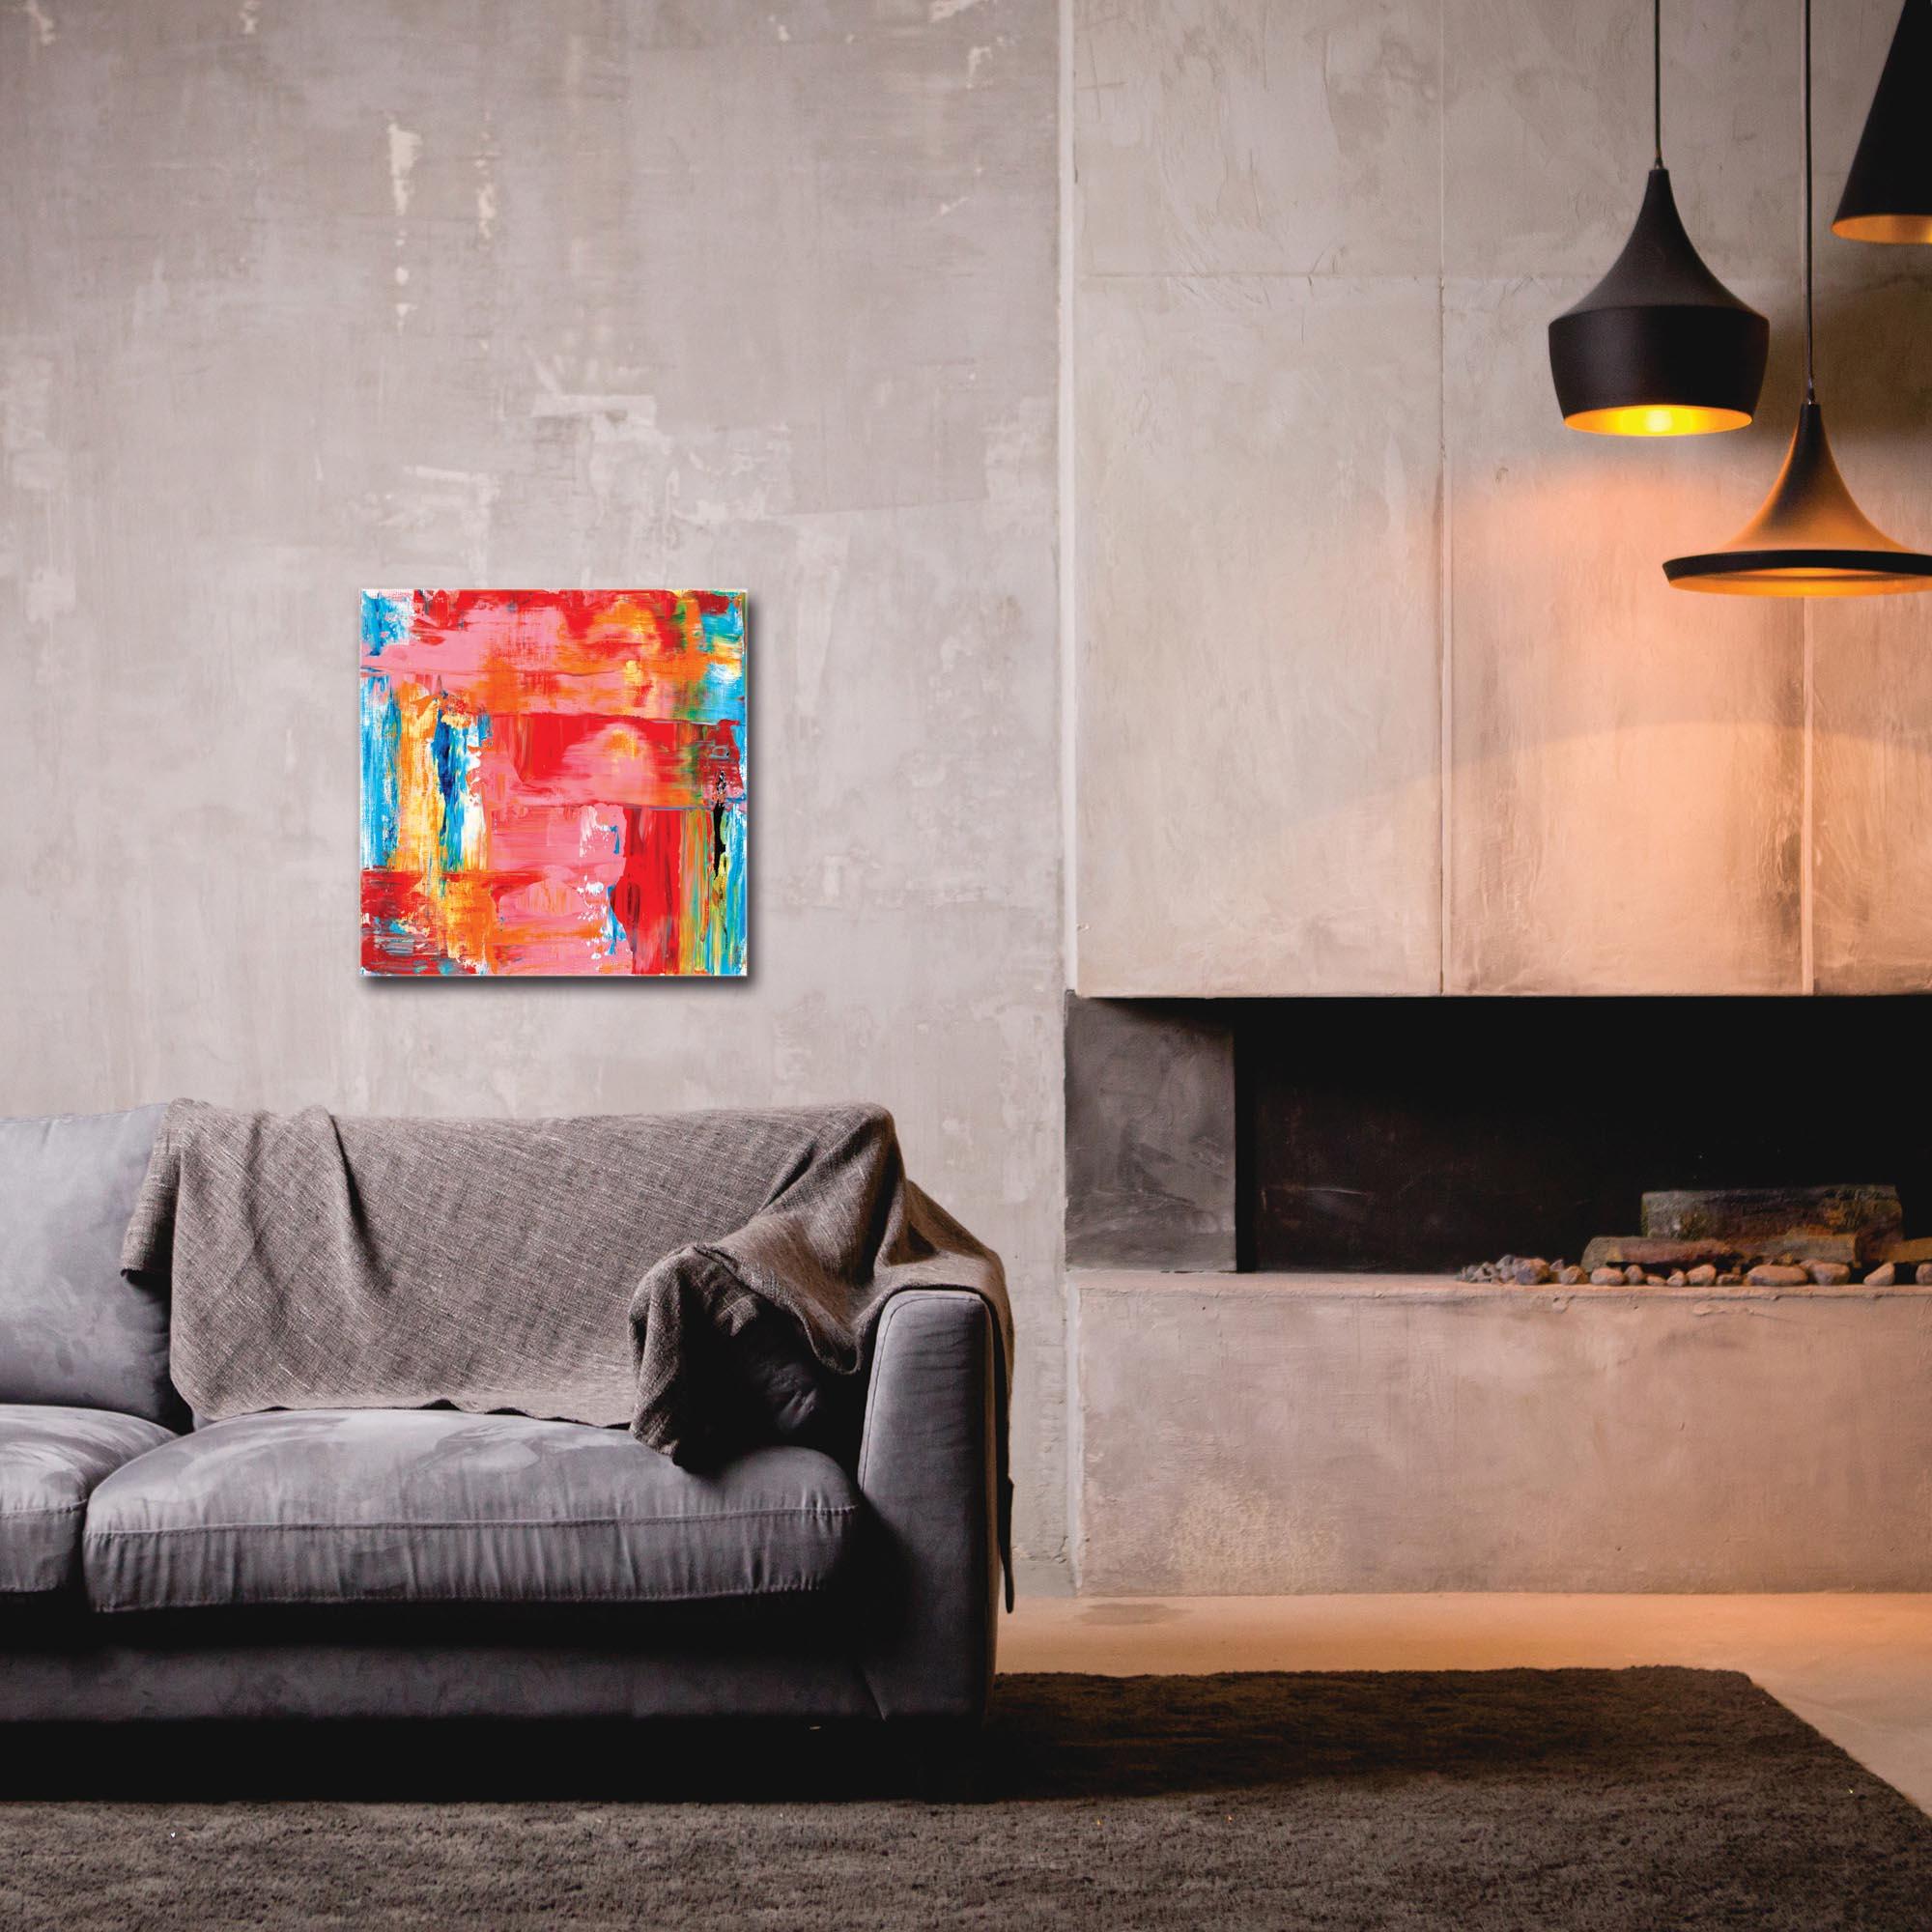 Abstract Wall Art 'Urban Life 1' - Urban Decor on Metal or Plexiglass - Image 3